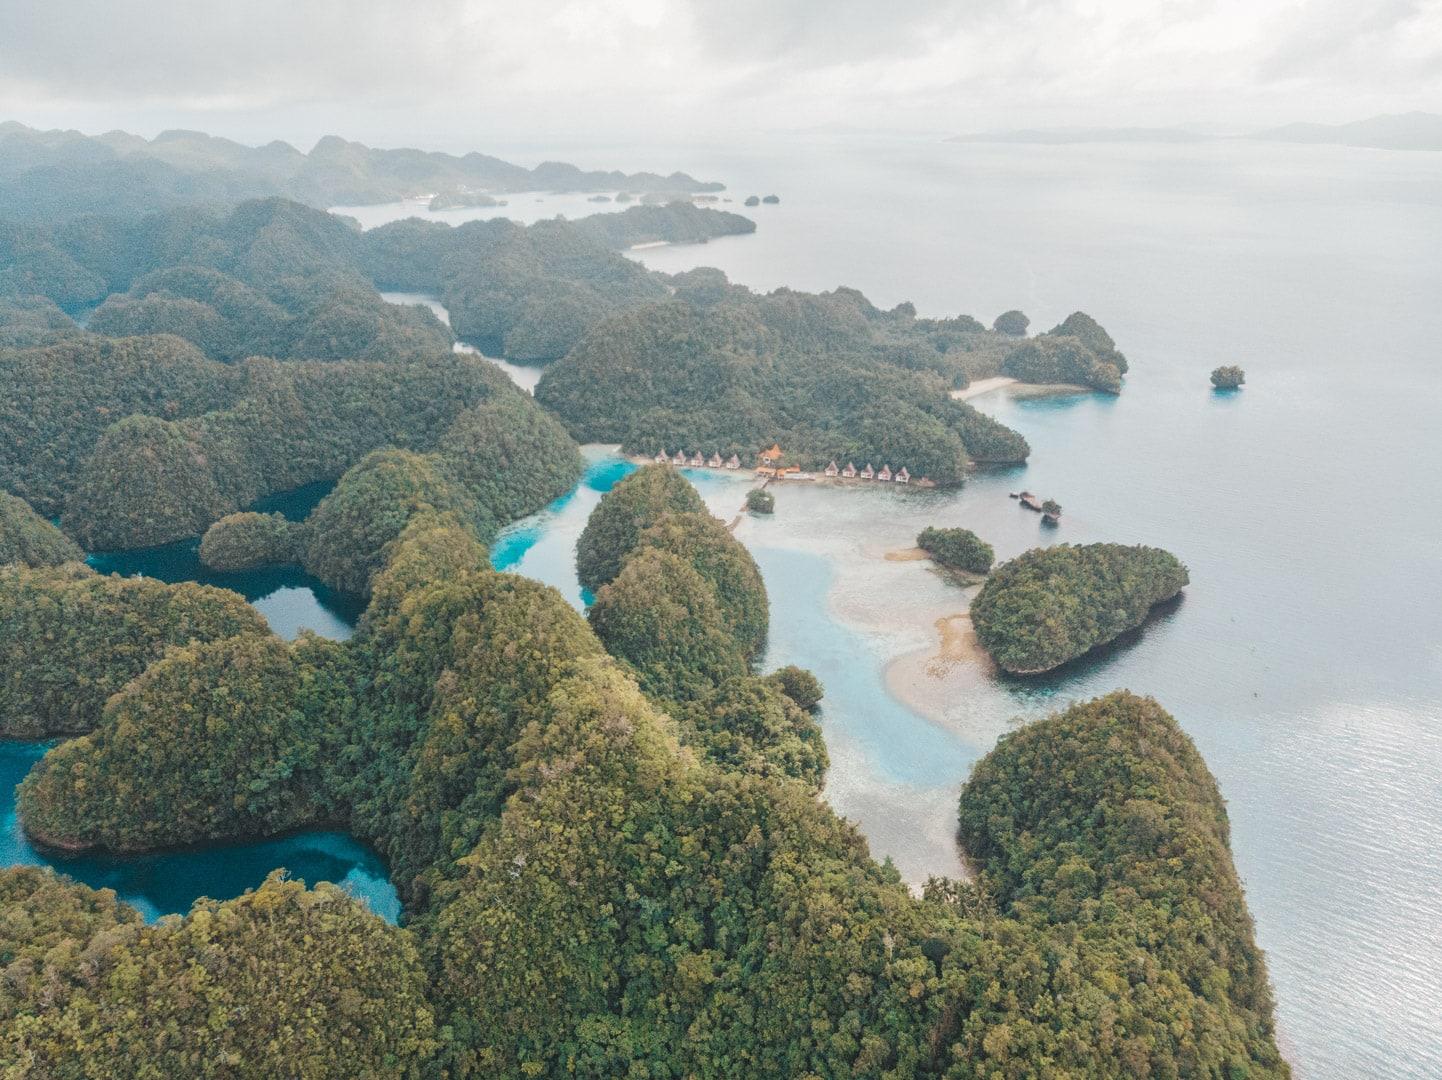 How to get to Sohoton Cove, Siargao Island